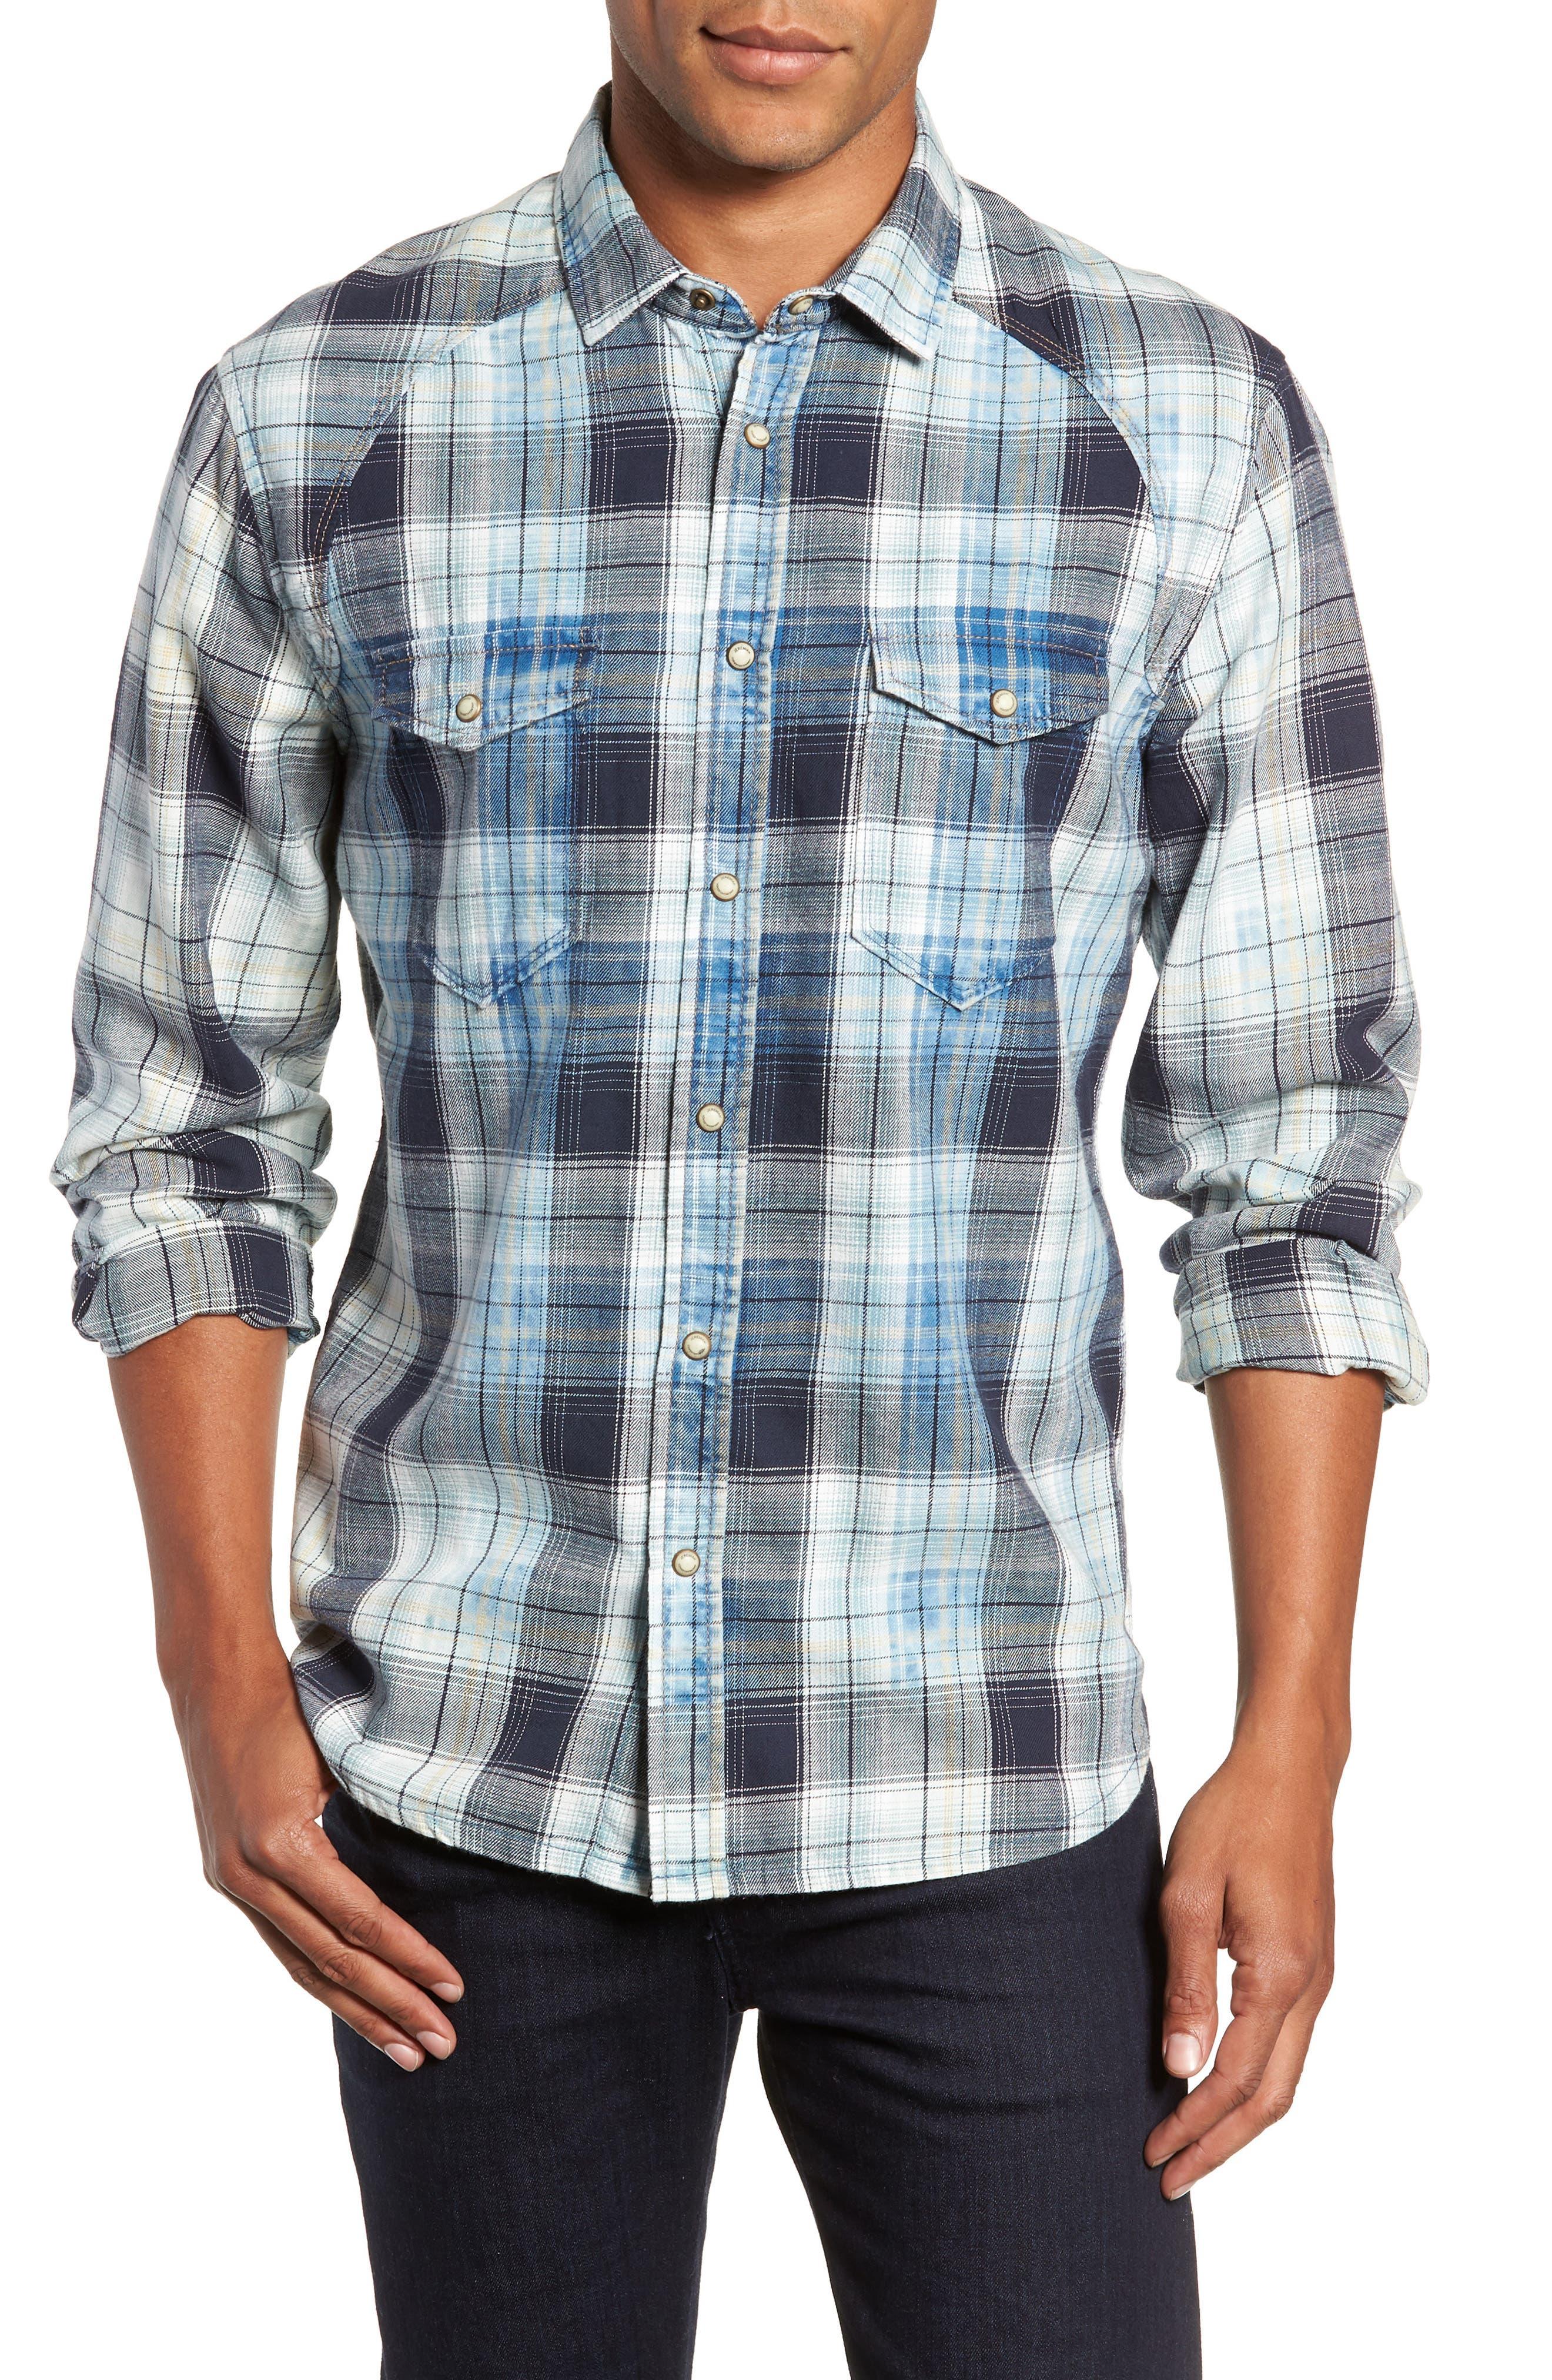 Sawtooth Regular Fit Crosshatch Plaid Shirt,                             Main thumbnail 1, color,                             ENSIGN BLUE